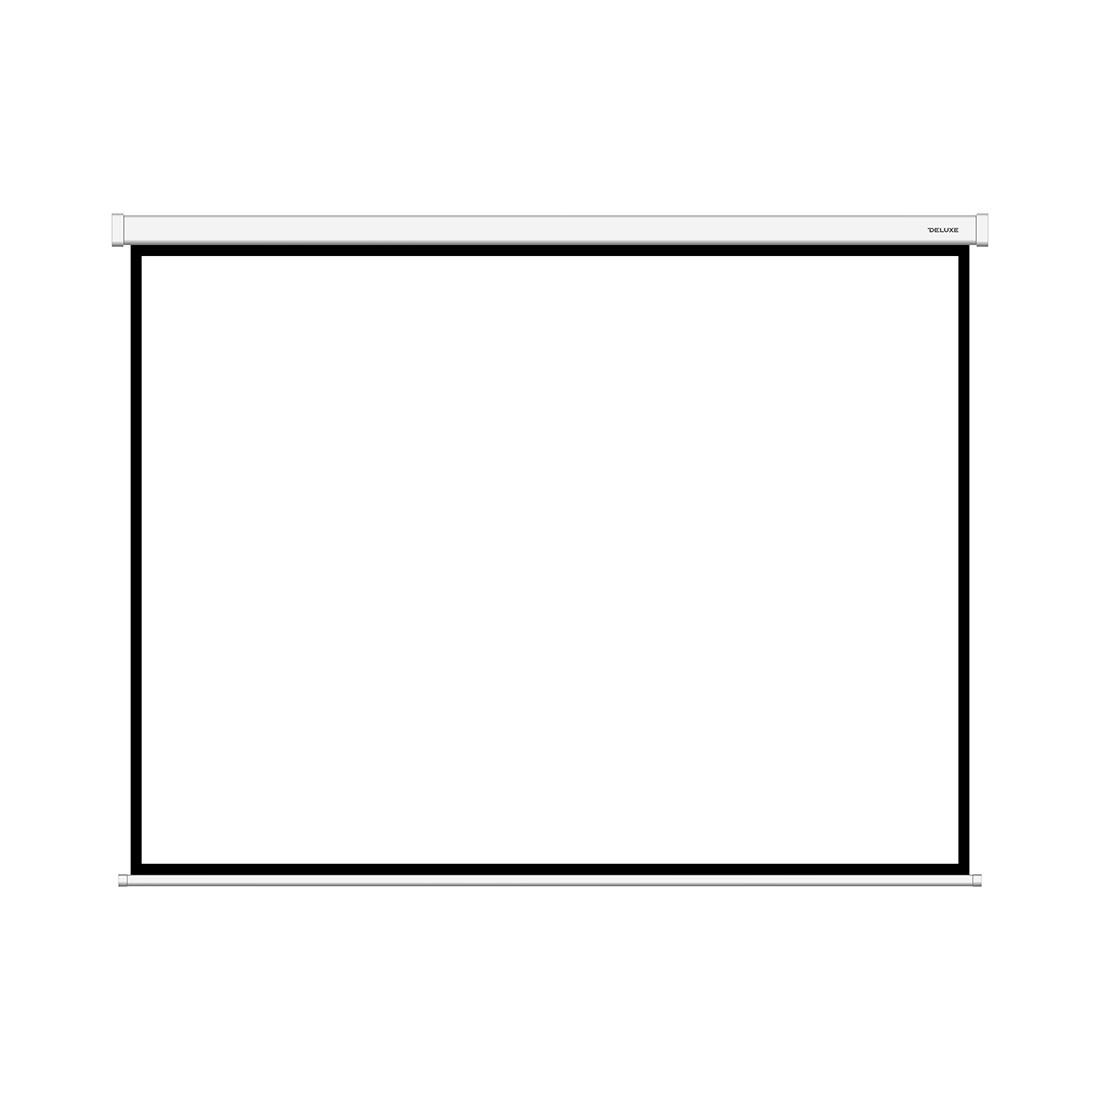 Экран для проекторов Deluxe DLS-M203x153W Настенный 203x153 Matt white Белый